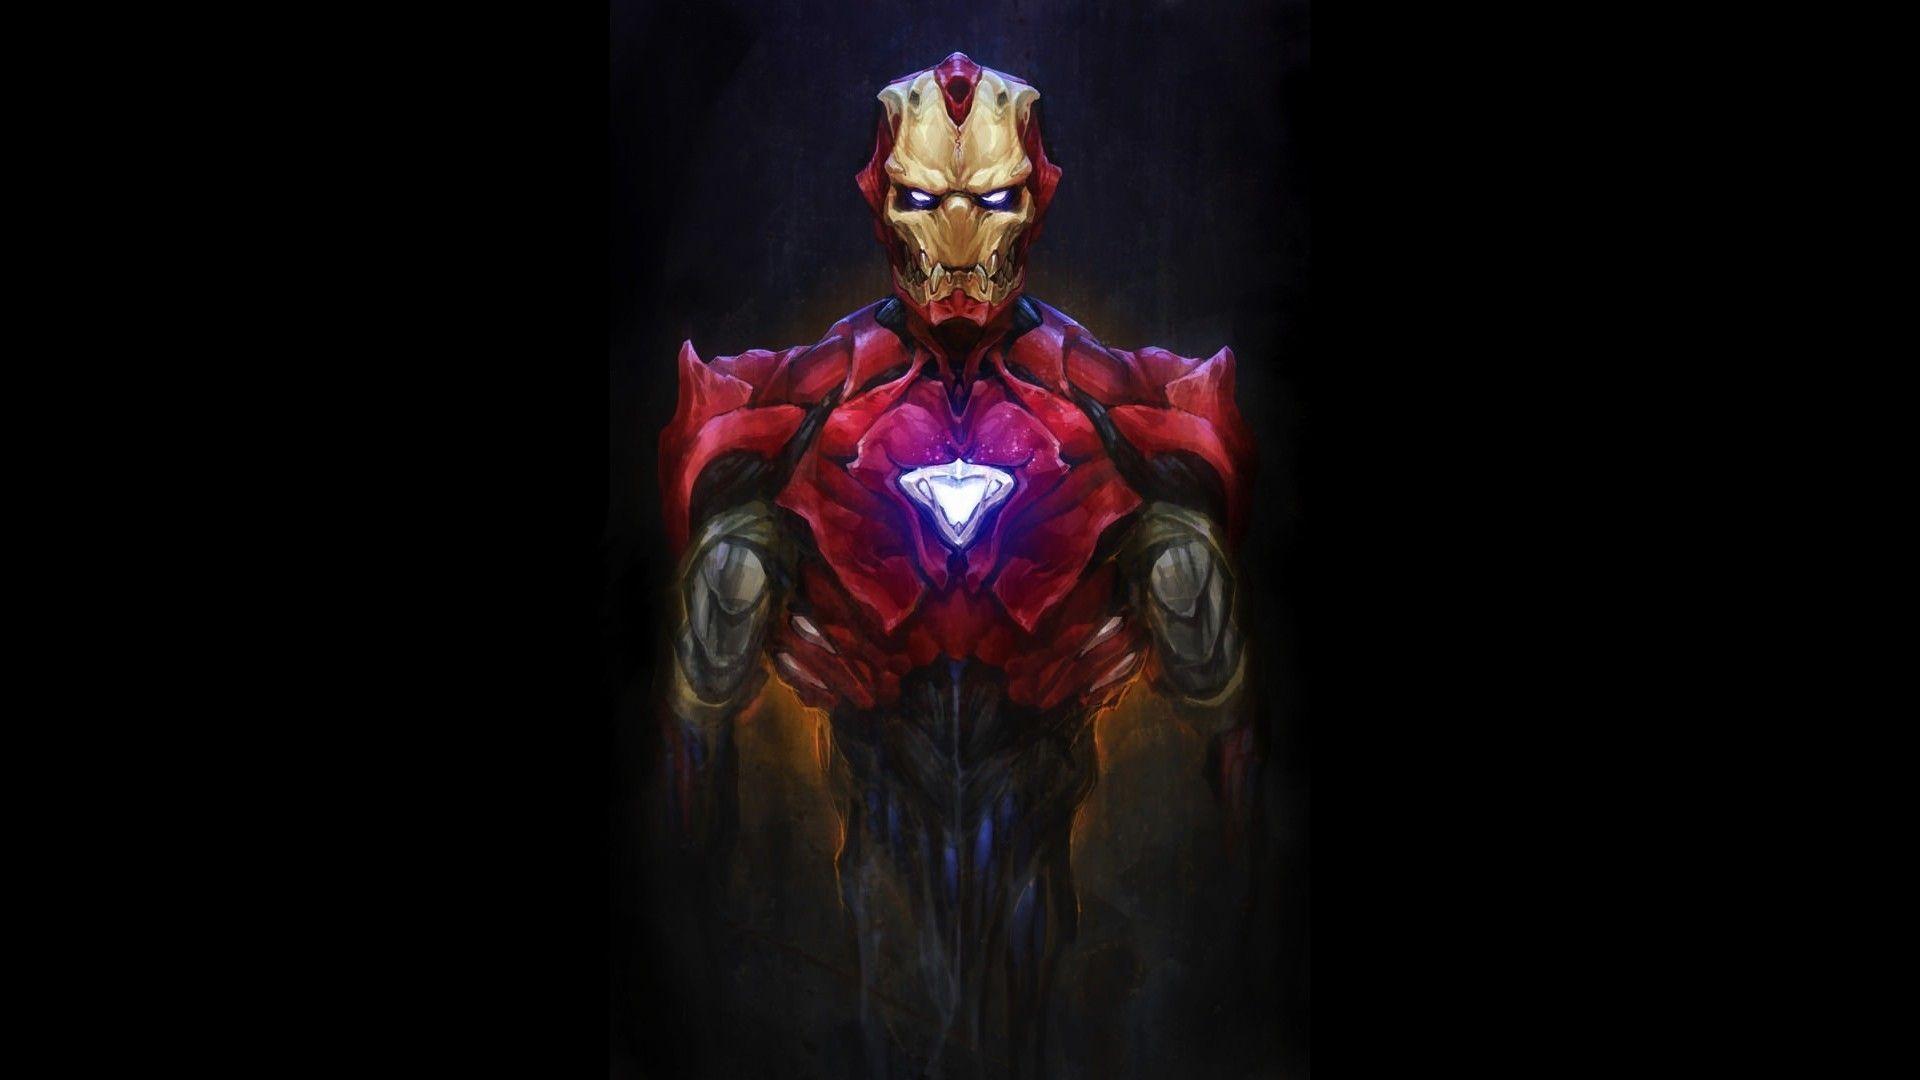 Suit Android Artwork Marvel Comics Bionic Evil 1920x1080